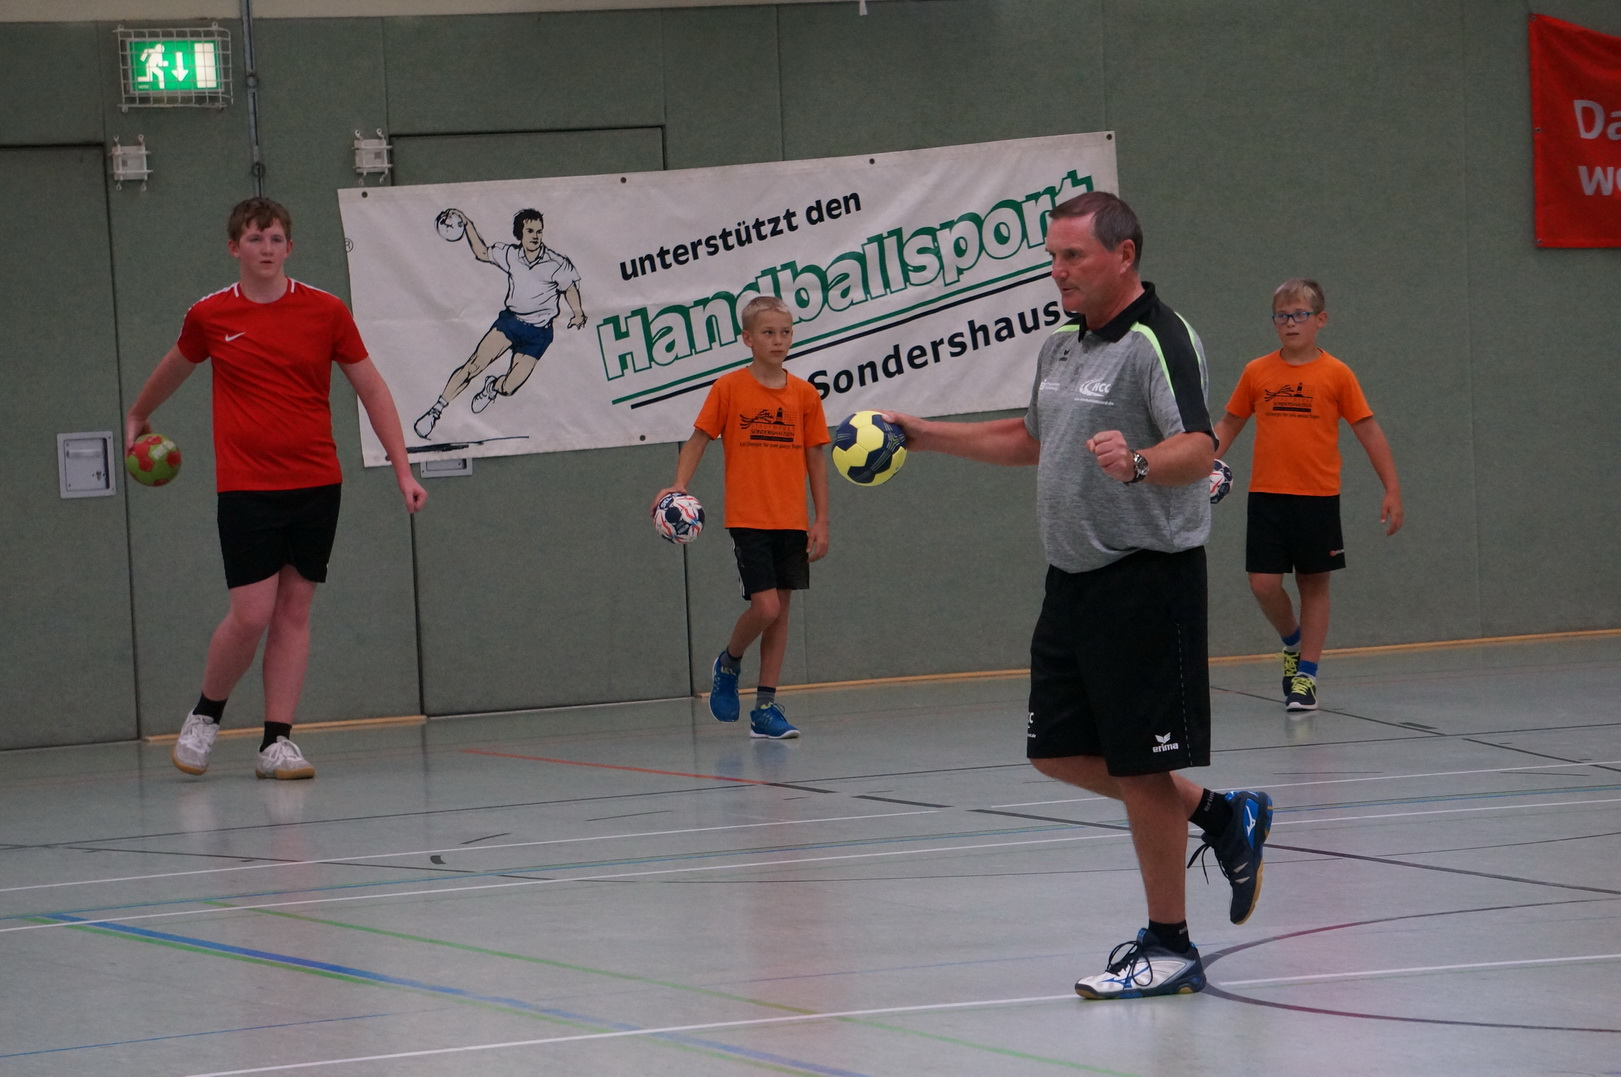 201808_Handballcamp_SDH_MG_044w